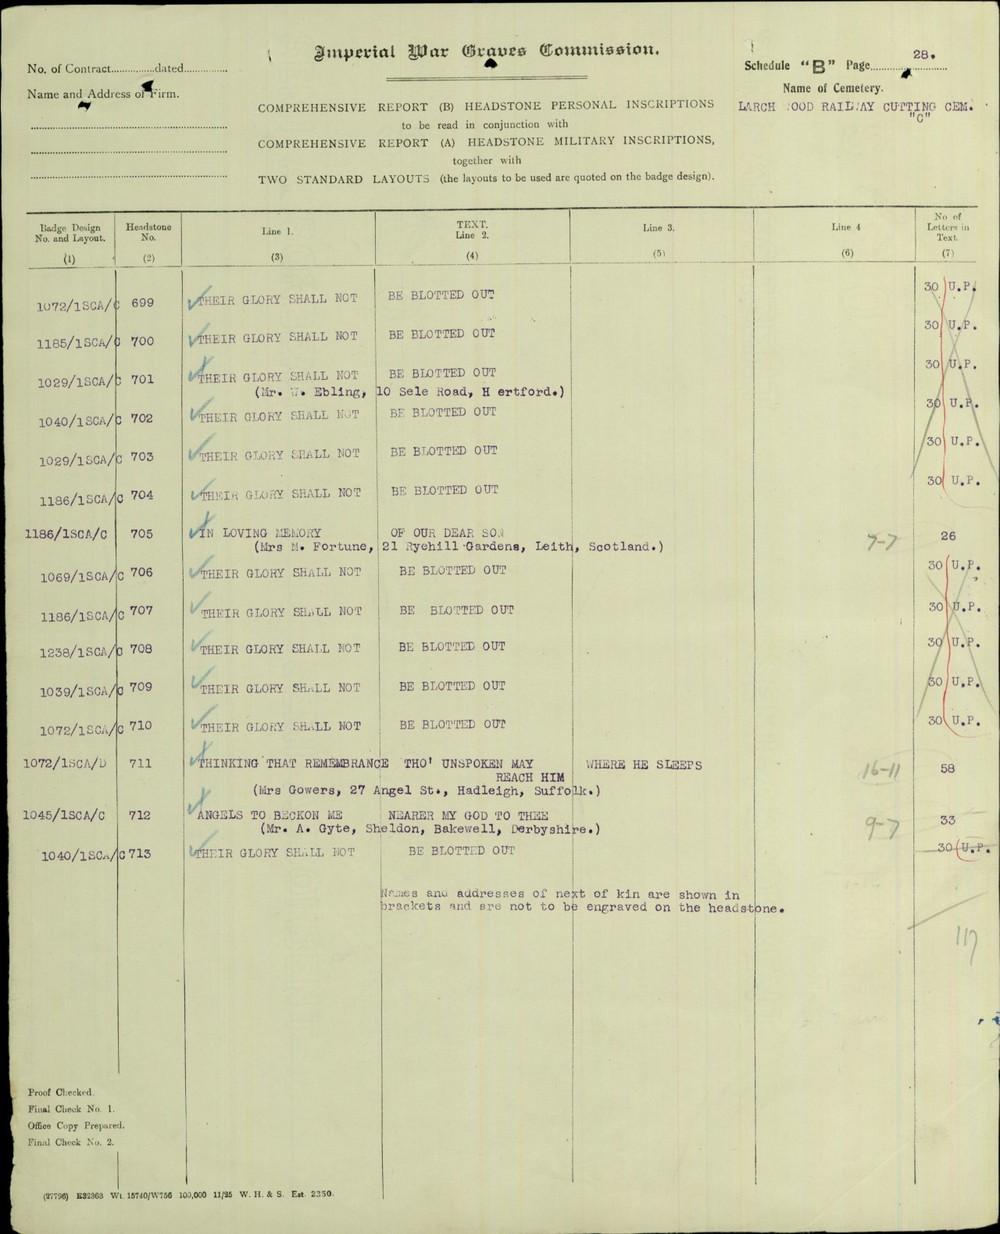 Bertie Gowers headstone schedule 2.JPG